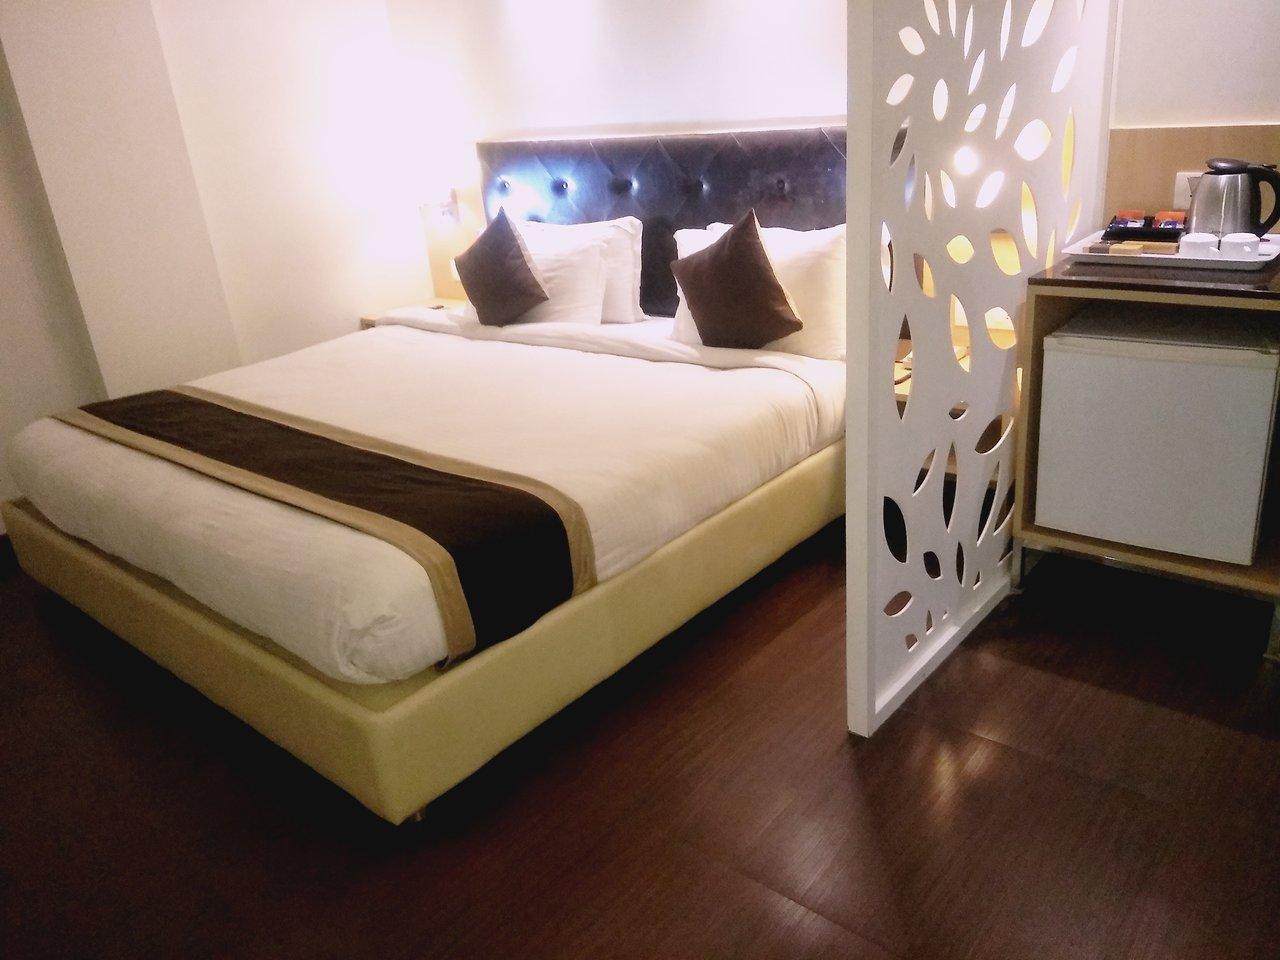 HOTEL THE BLOSSOM (Vapi, Gujarat) - Hotel Reviews, Photos